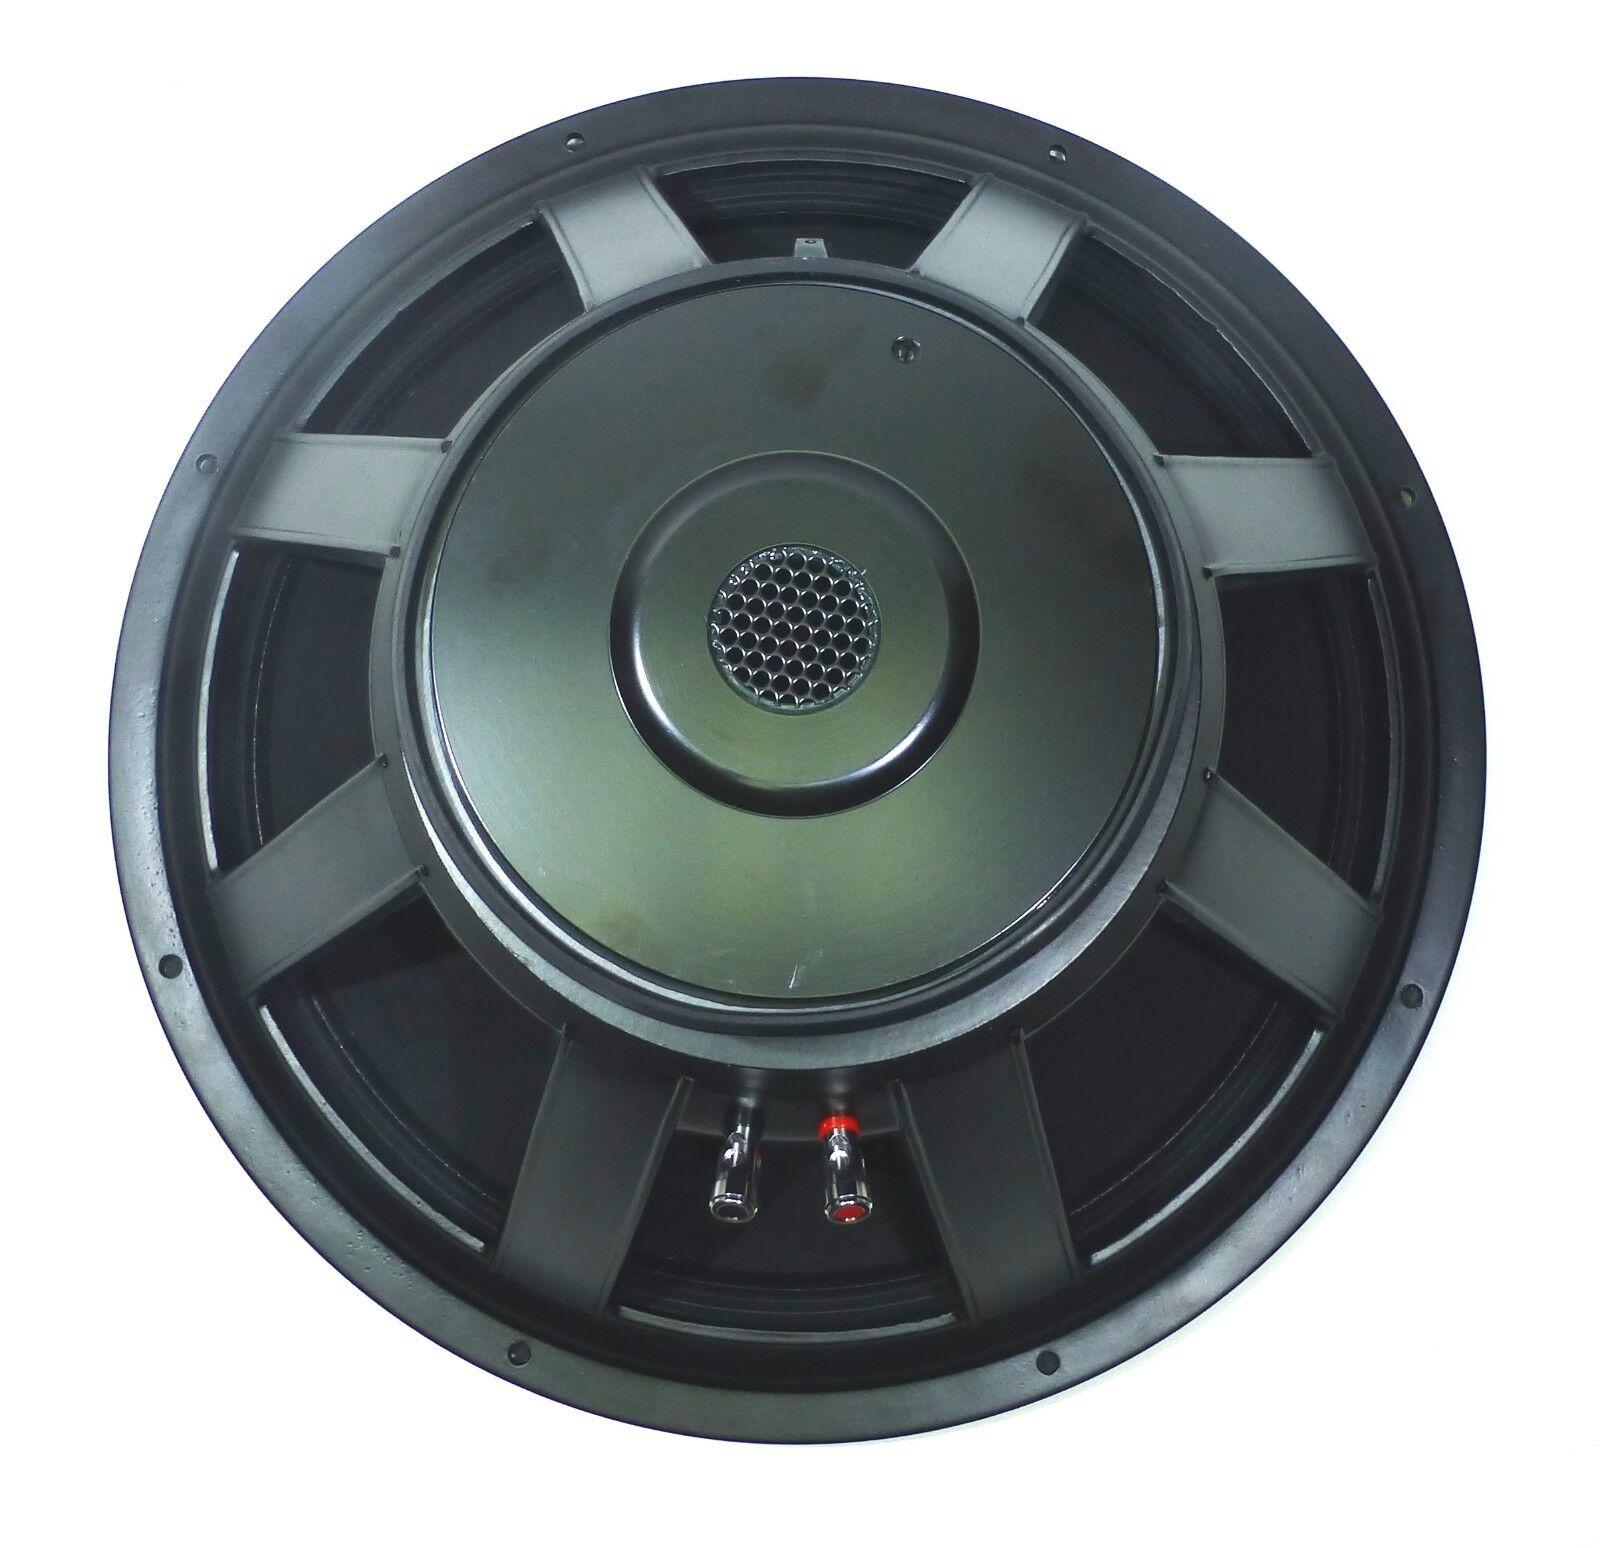 Replacement Speaker For Bag End 18  Woofer EL-18A, S18, D18, Quatrz Series 8Ω